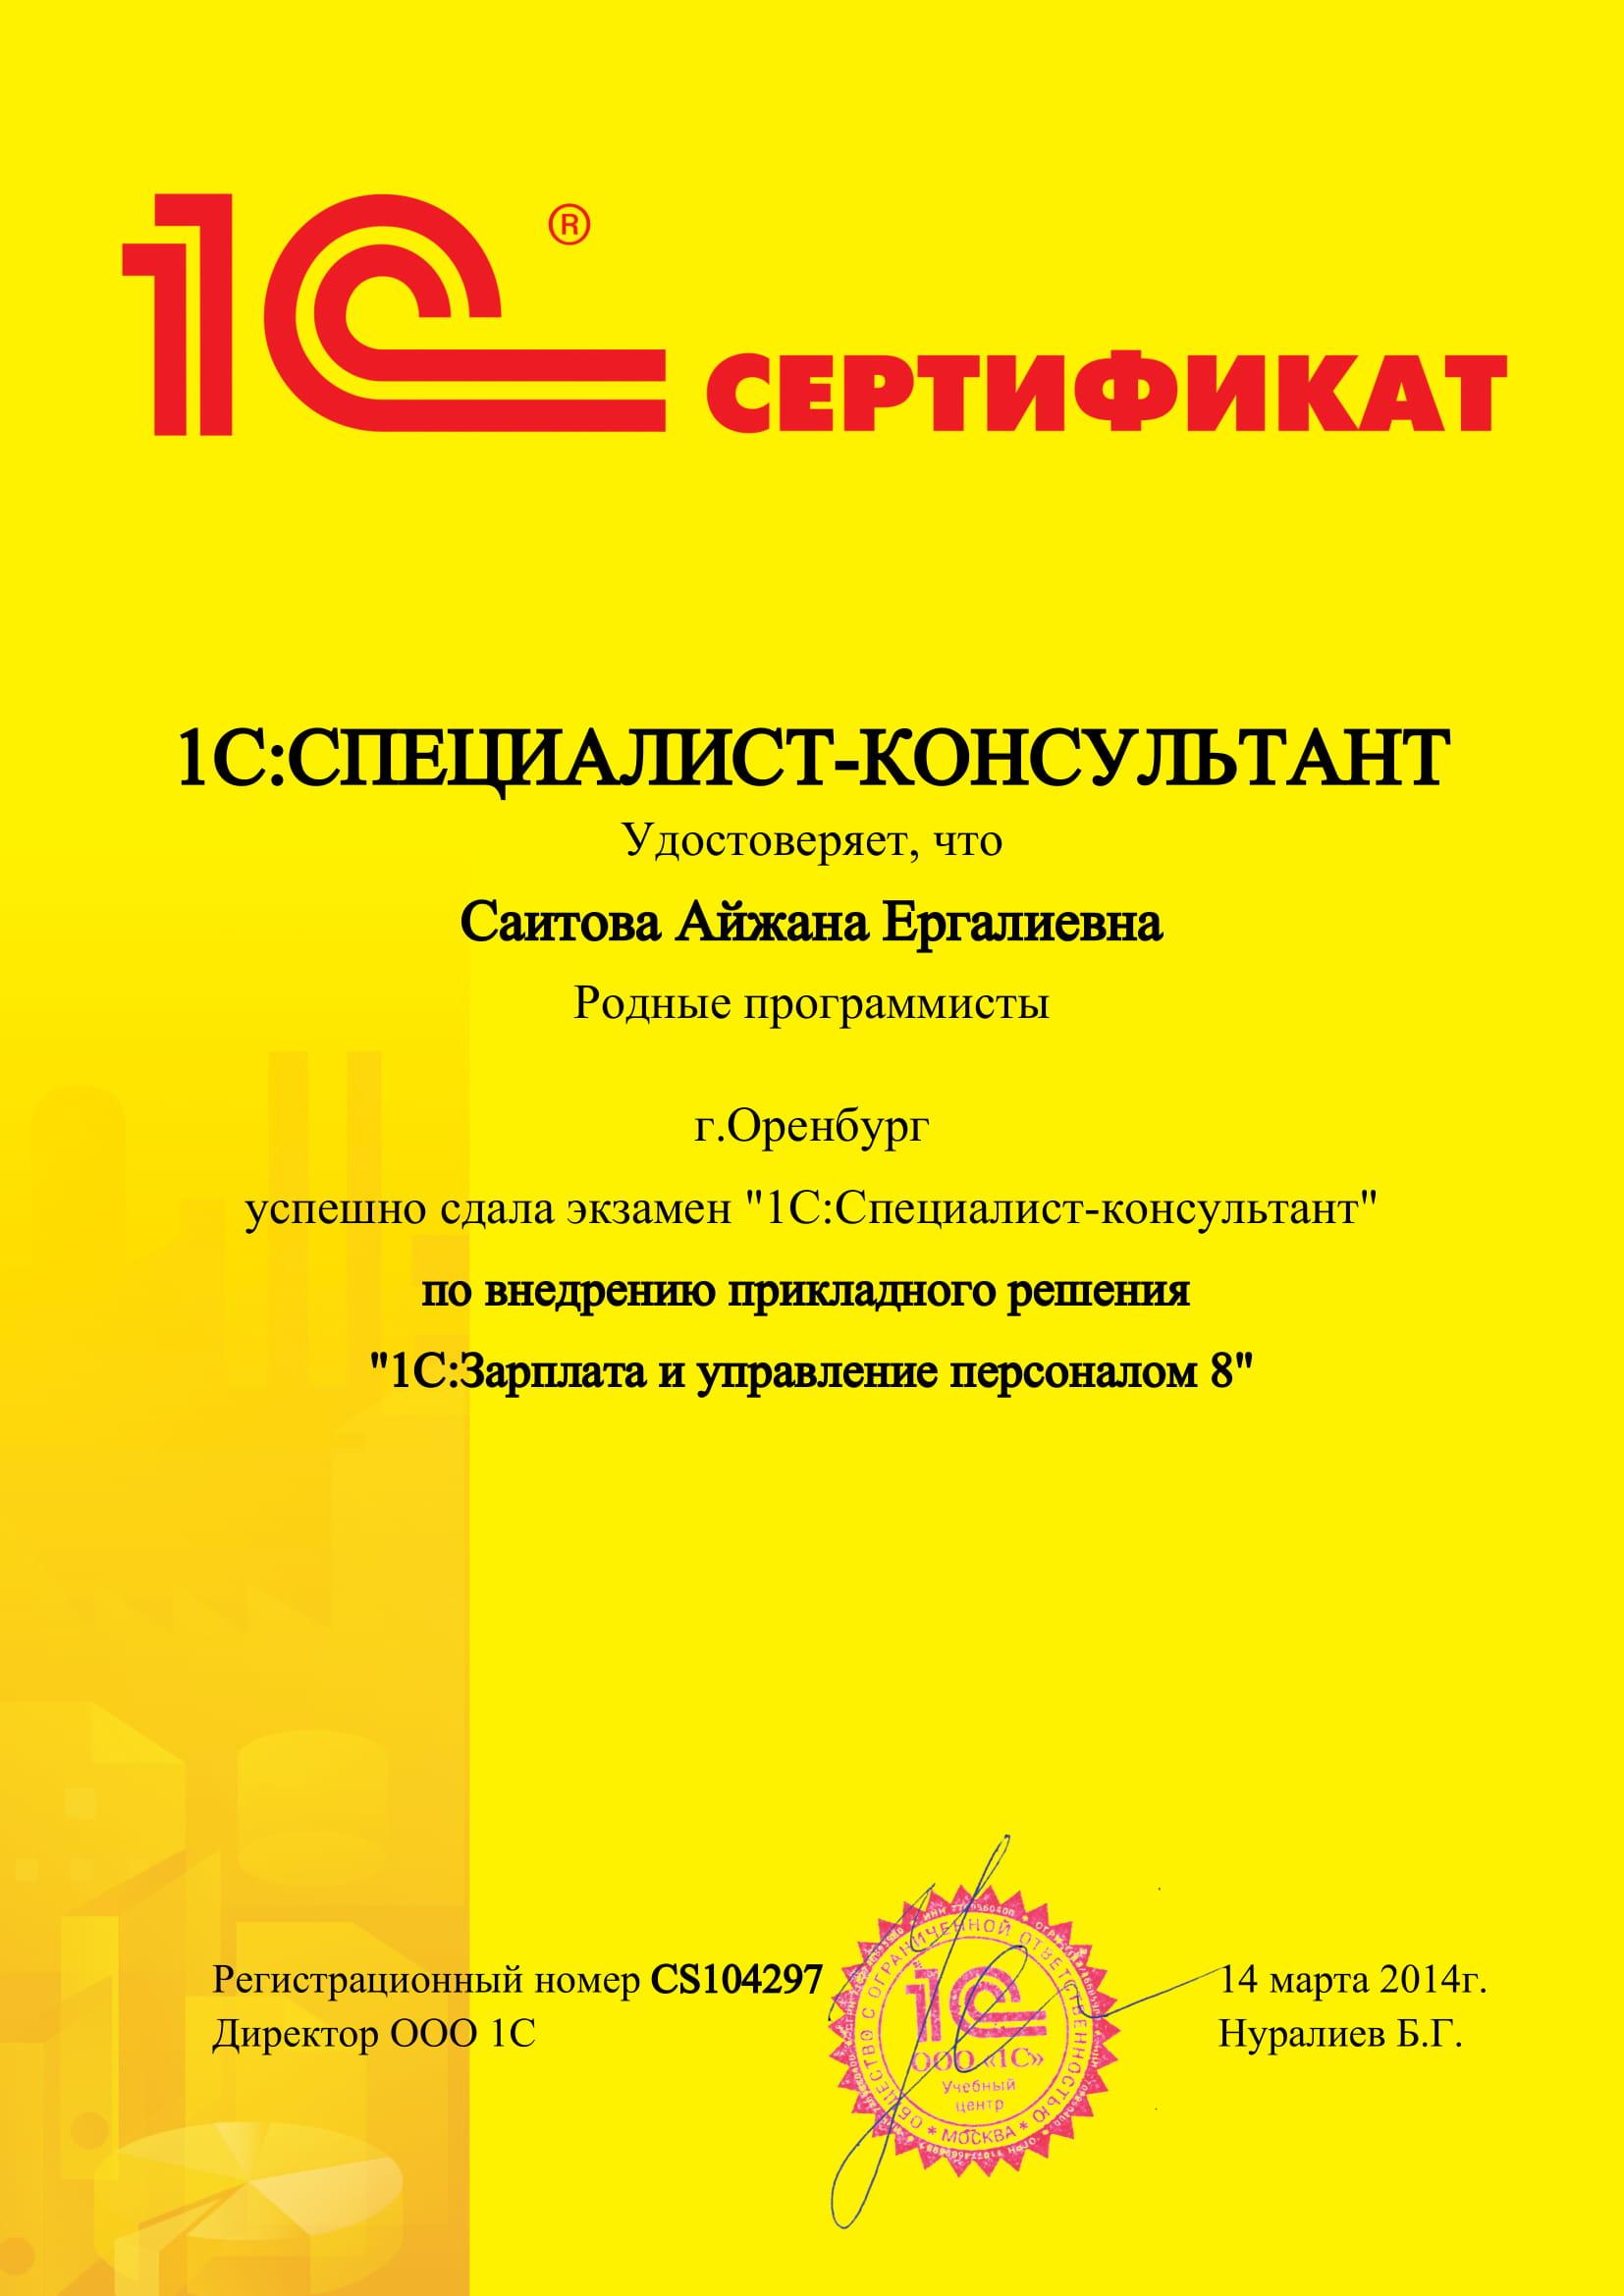 Саитова Айжана Специалист-консультант ЗУП-1